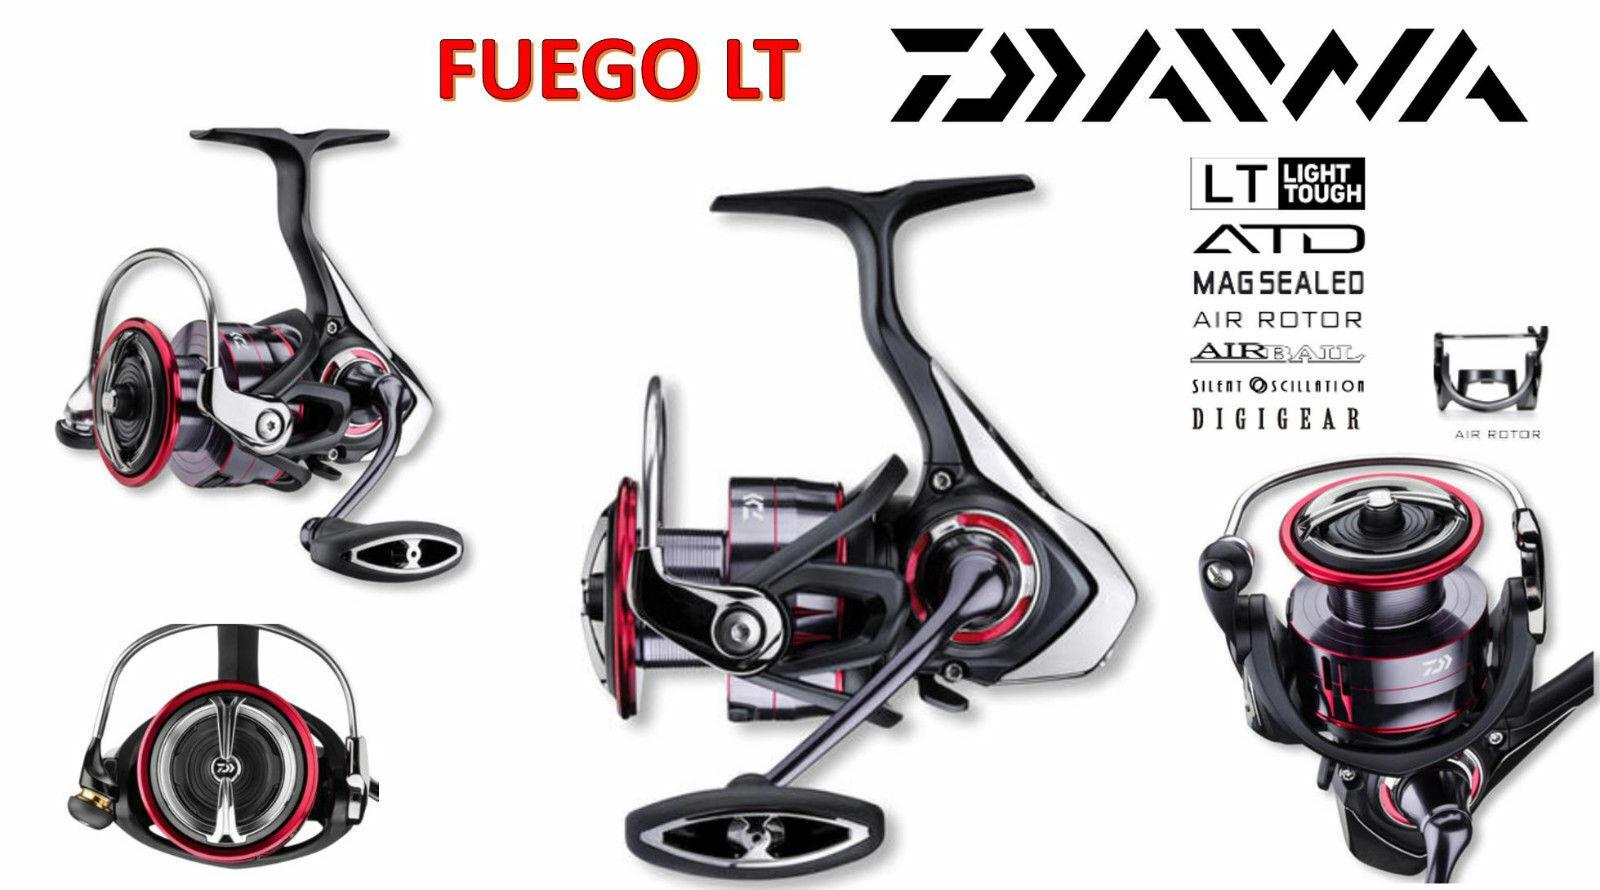 Daiwa Fuego LT 1000D 2000D 2500D 3000D-C 3000CXH 4000D-C 6000D MAGSEALED-role